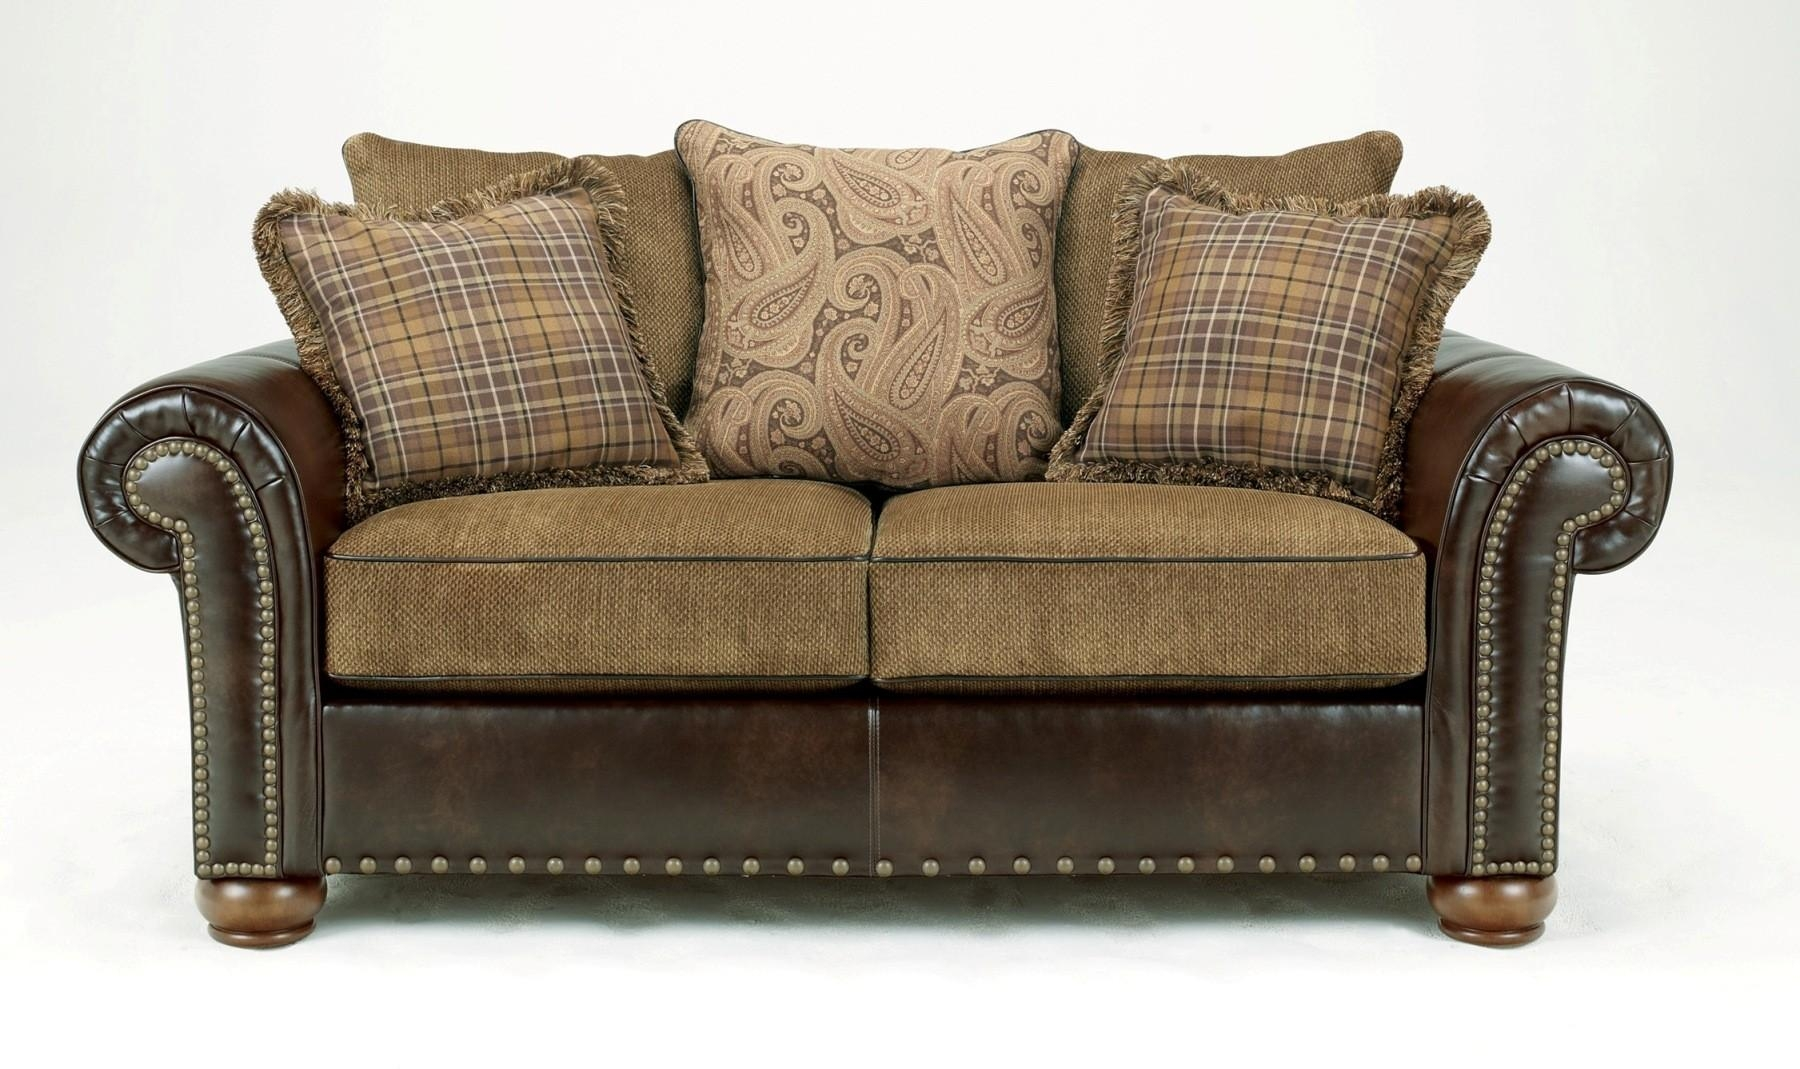 Bradington Truffle Sofa | Sofa Gallery | Kengire Throughout Bradington Truffle Sofas (Image 10 of 20)